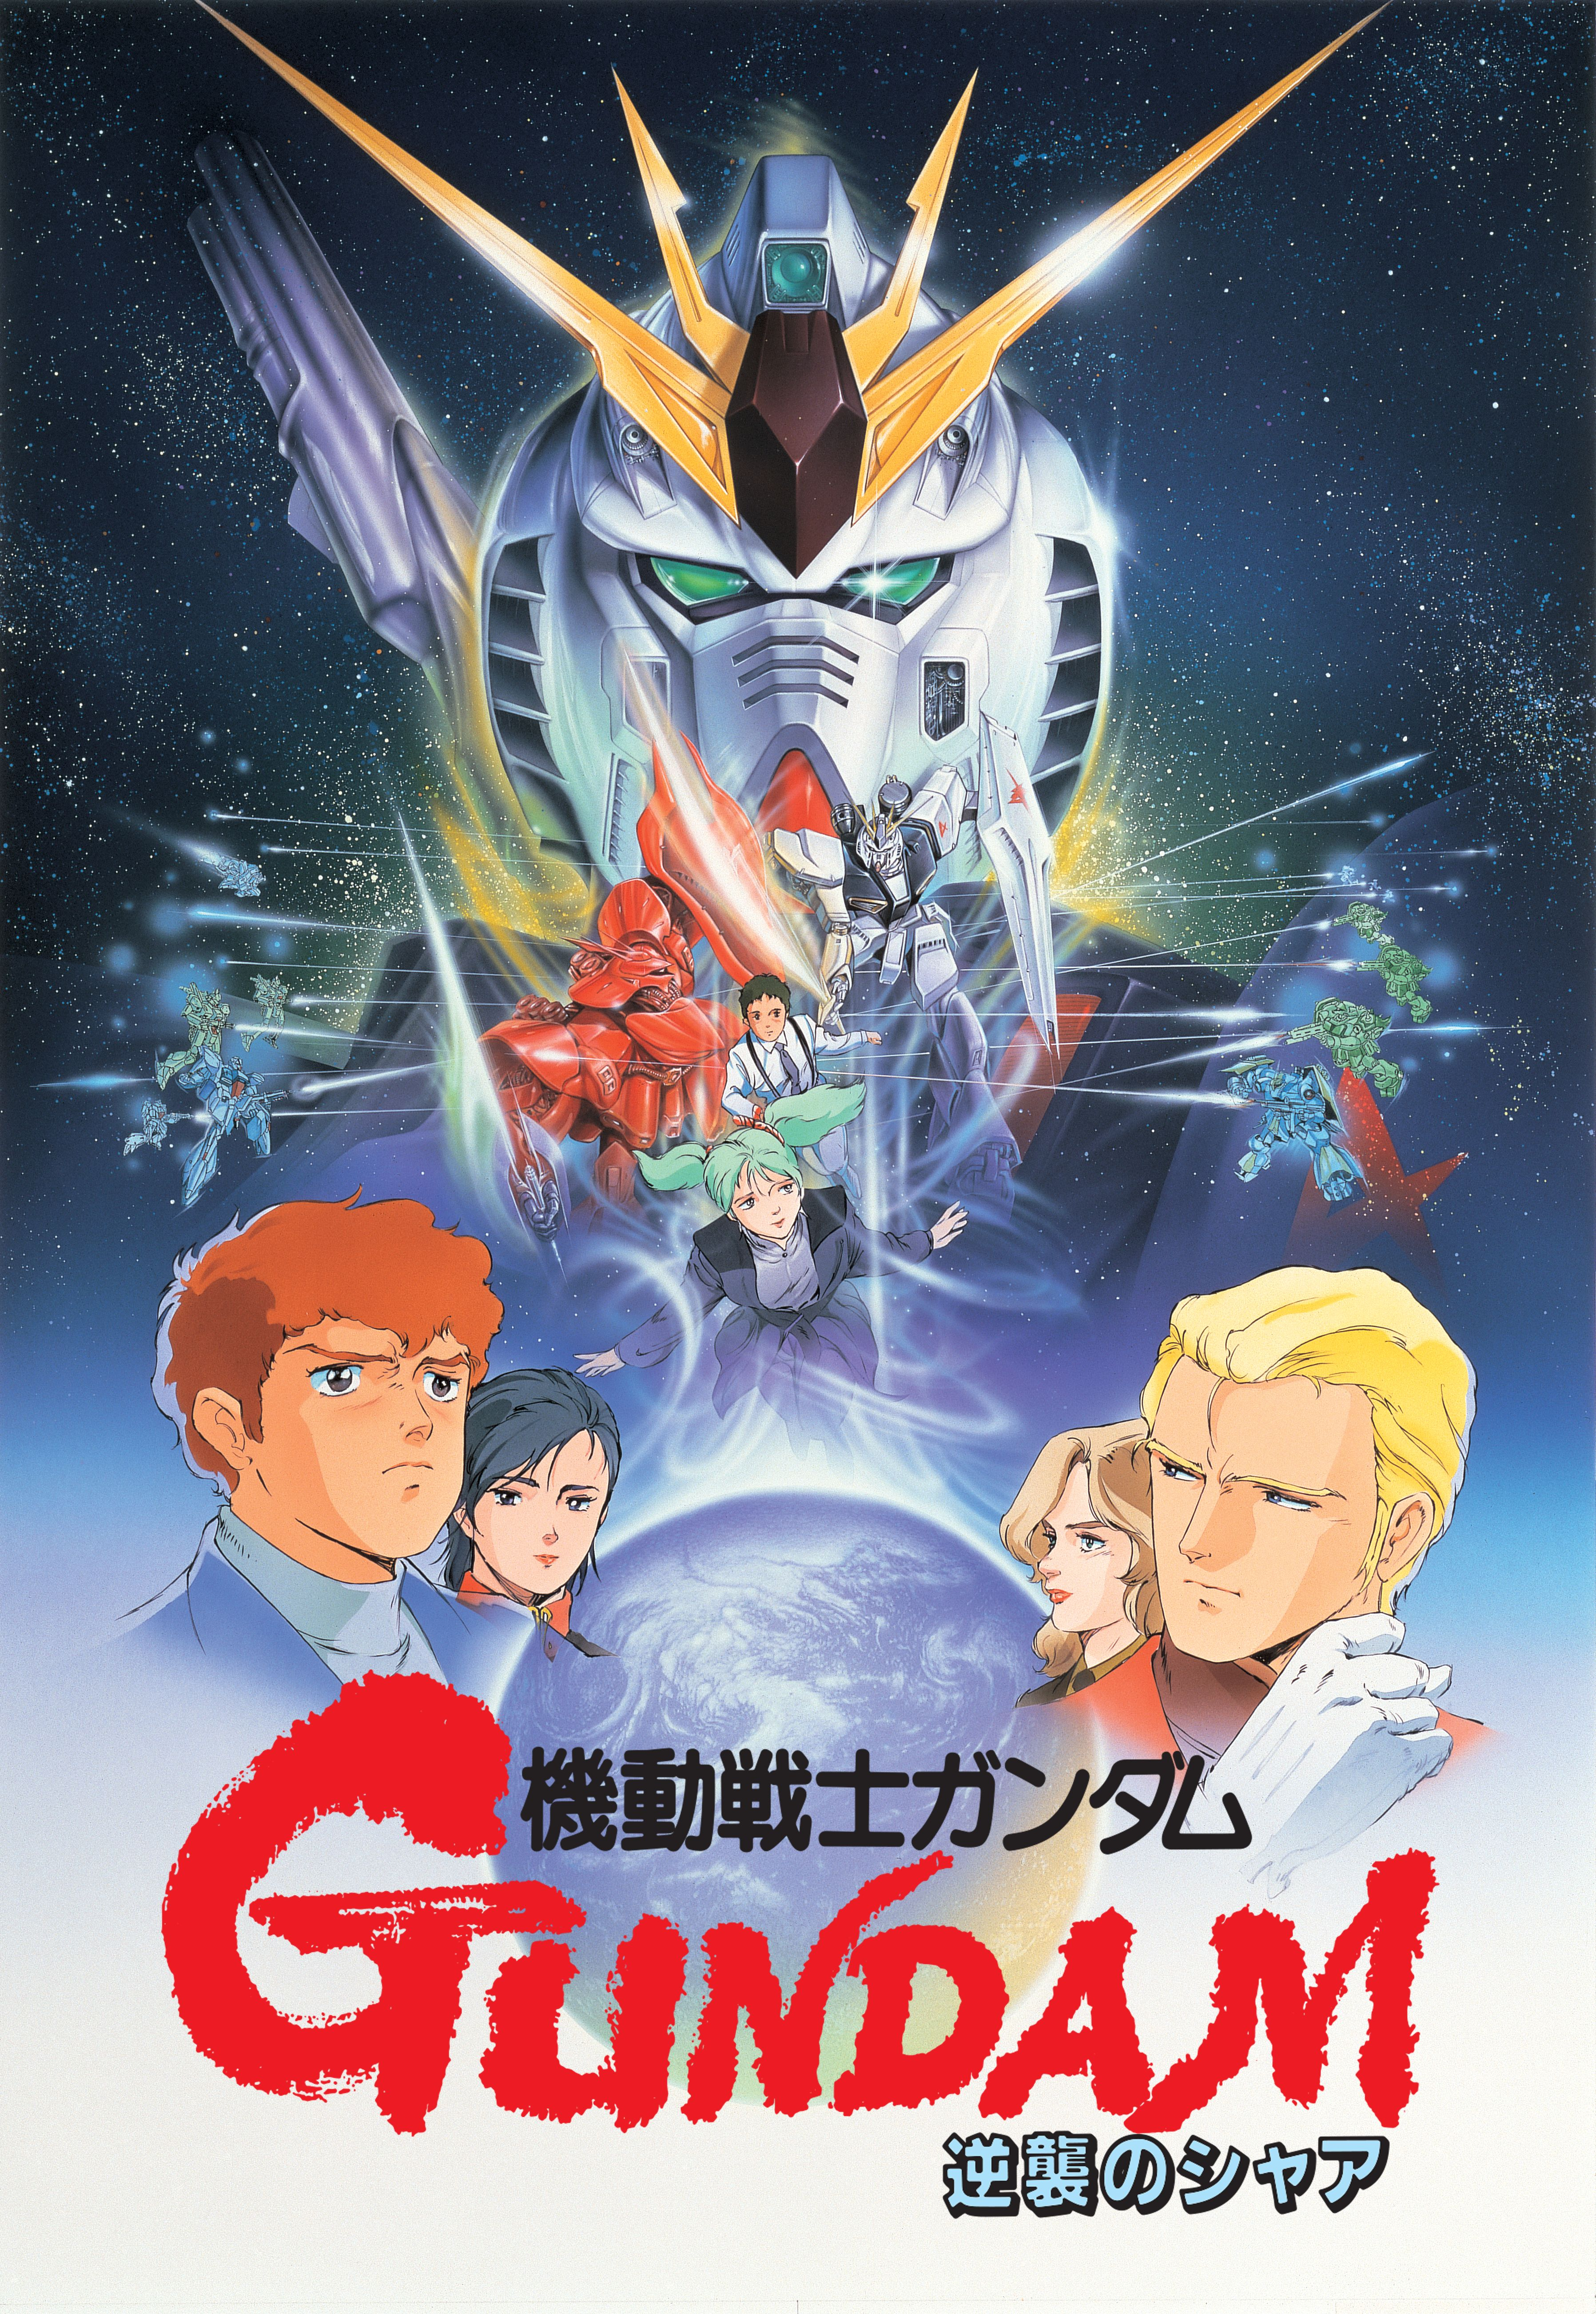 File:Mobile Suit Gundam Char's Counterattack.jpg